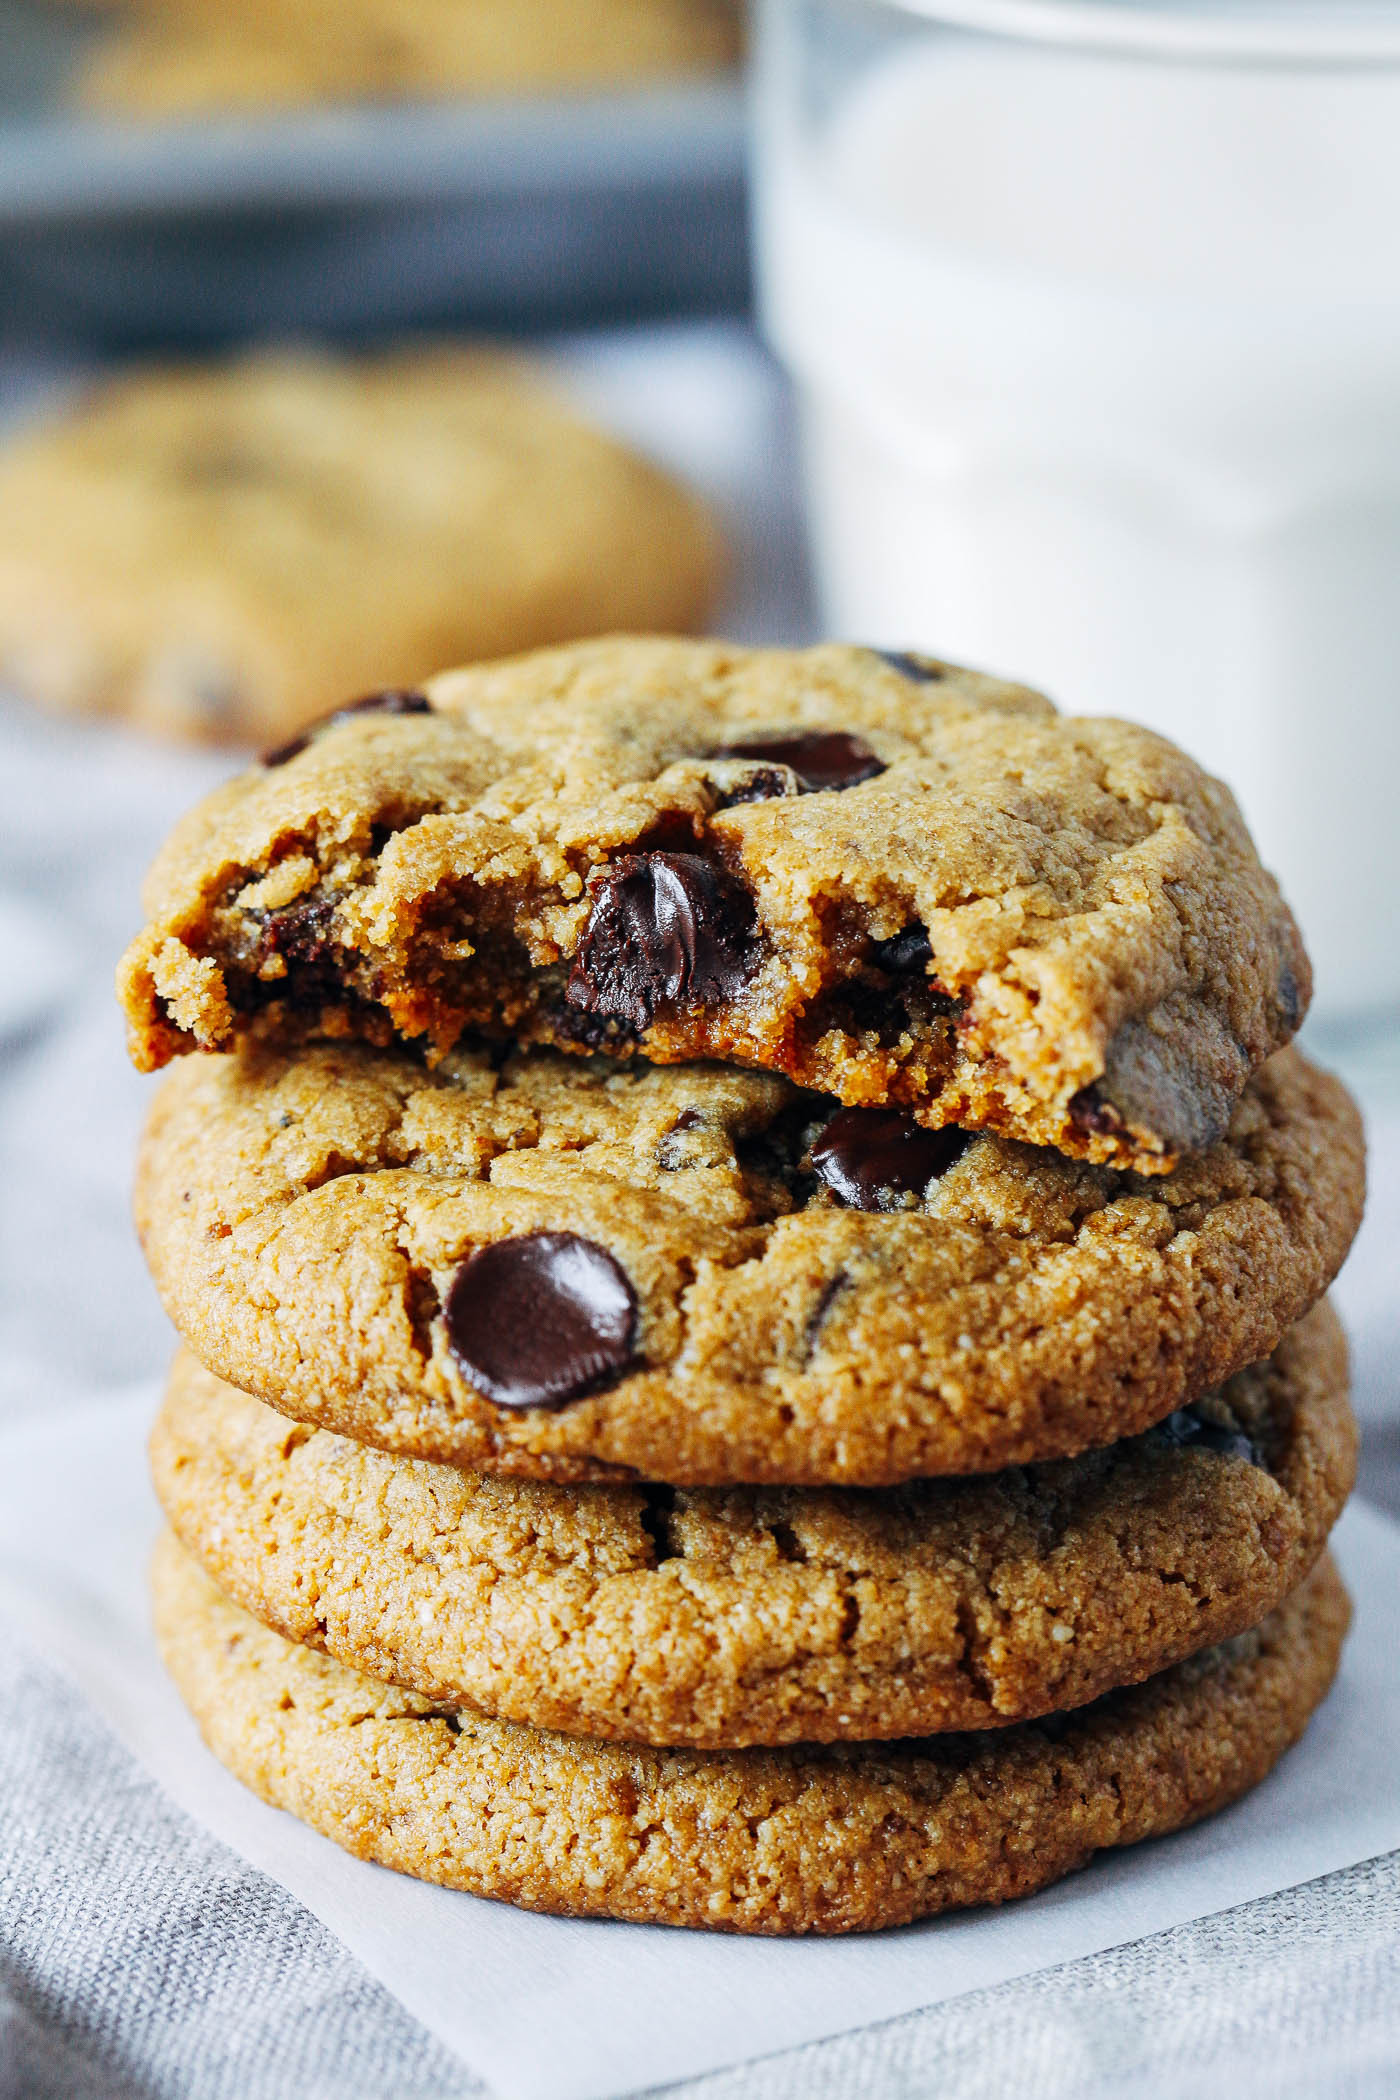 Vegan Gluten Free Chocolate Chip Cookies  The Best Vegan and Gluten free Chocolate Chip Cookies